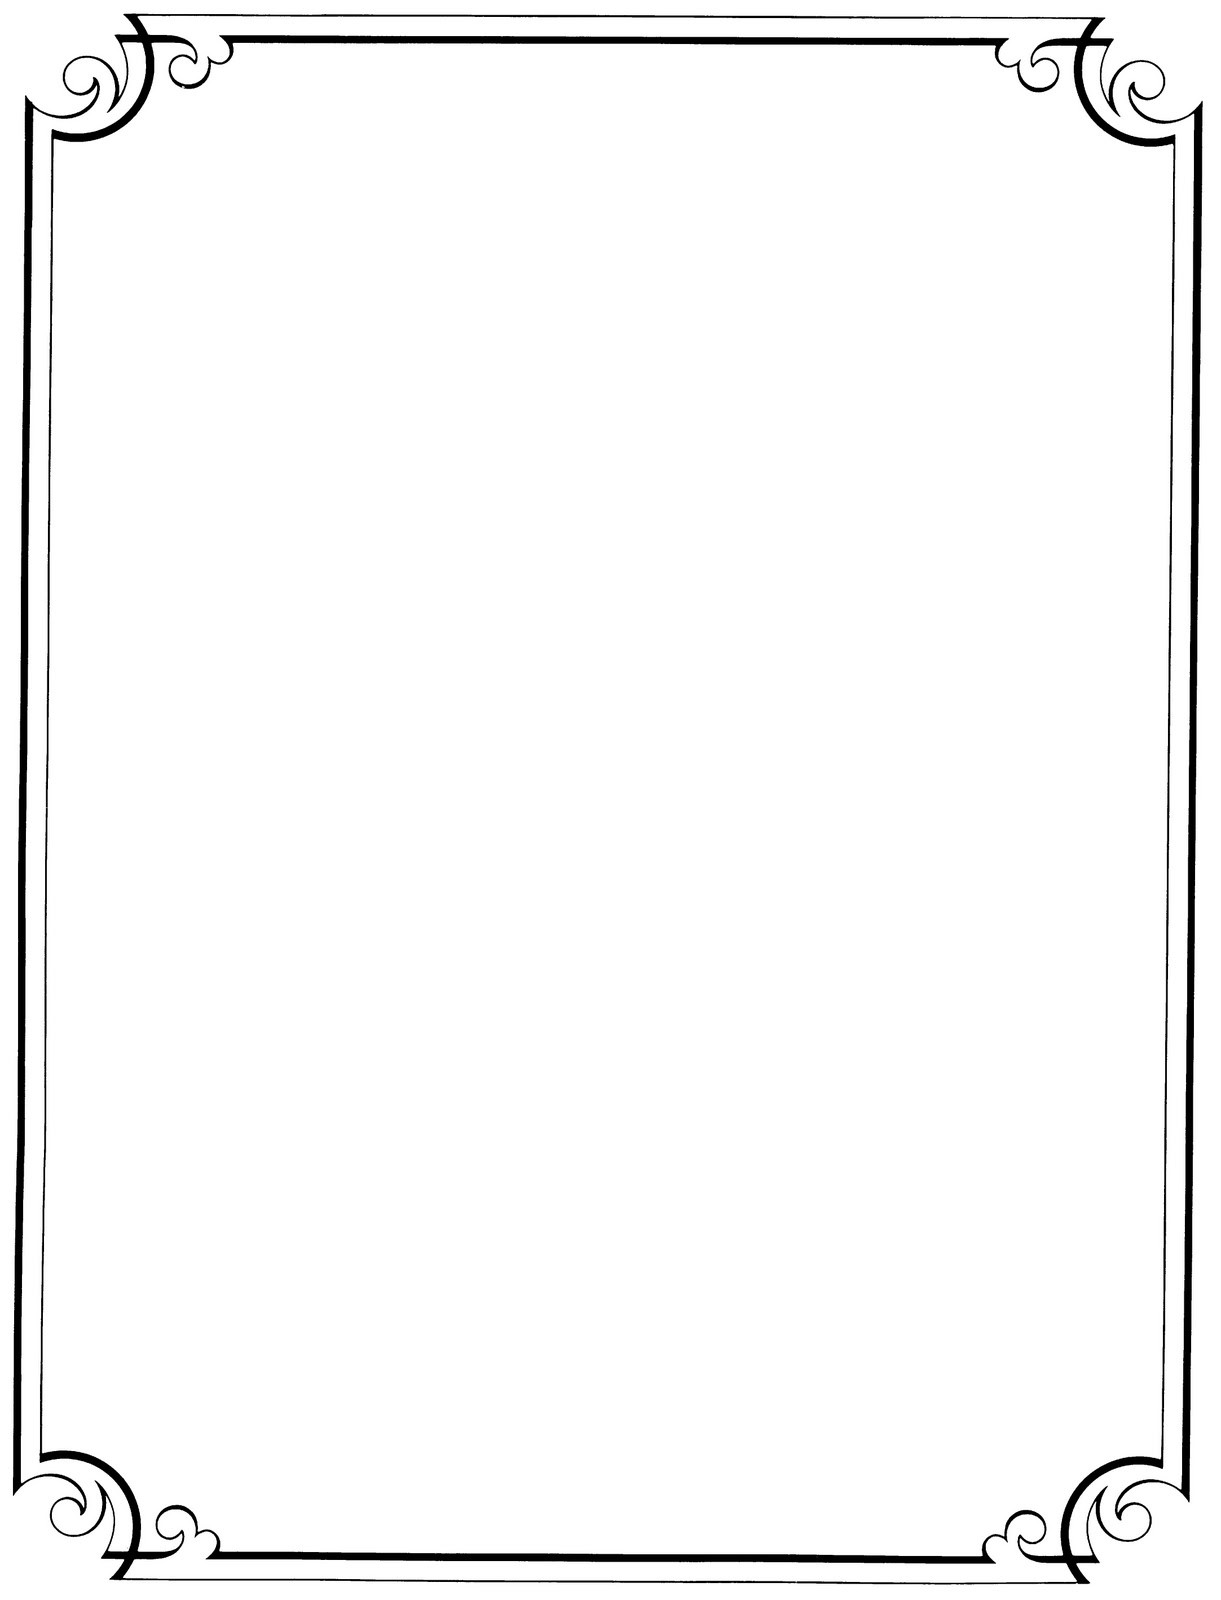 bnw-printable-frame-blank-certificate